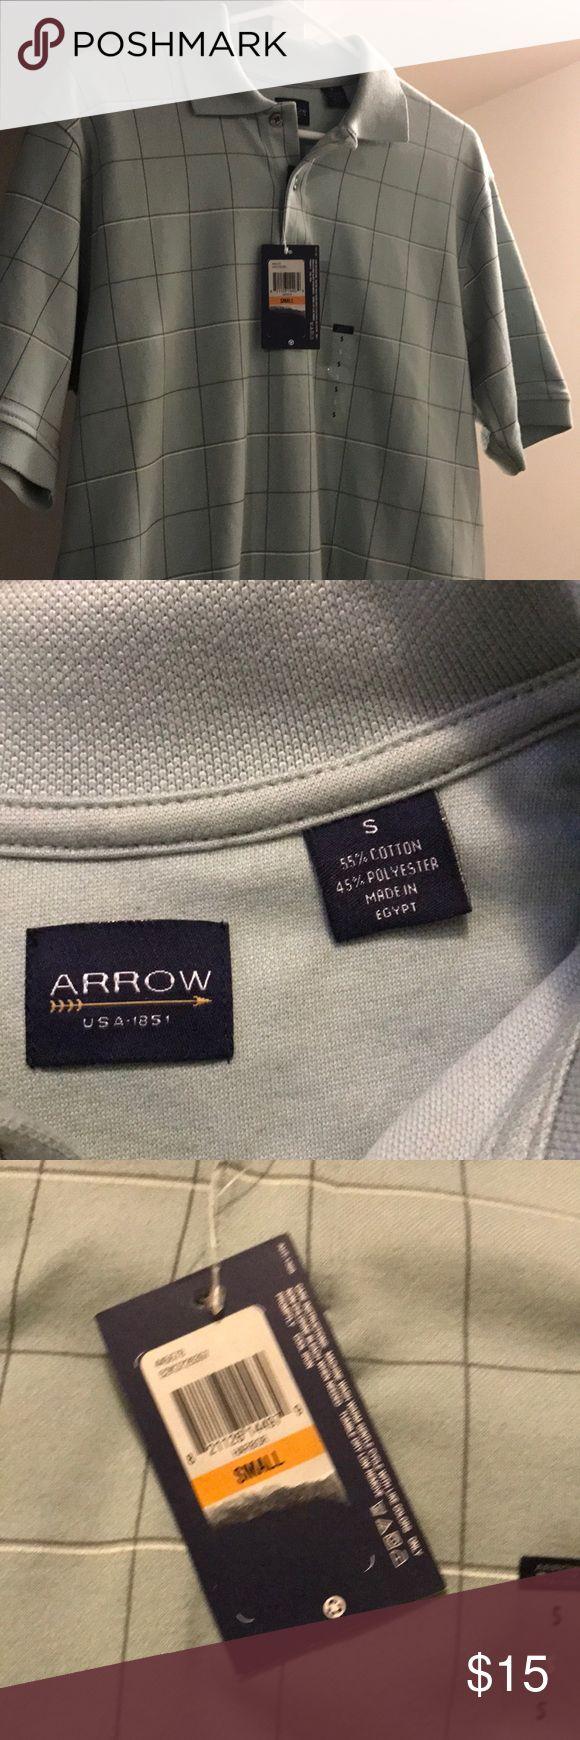 Dress shirt Arrow brand. NWT. Arrow Shirts Polos